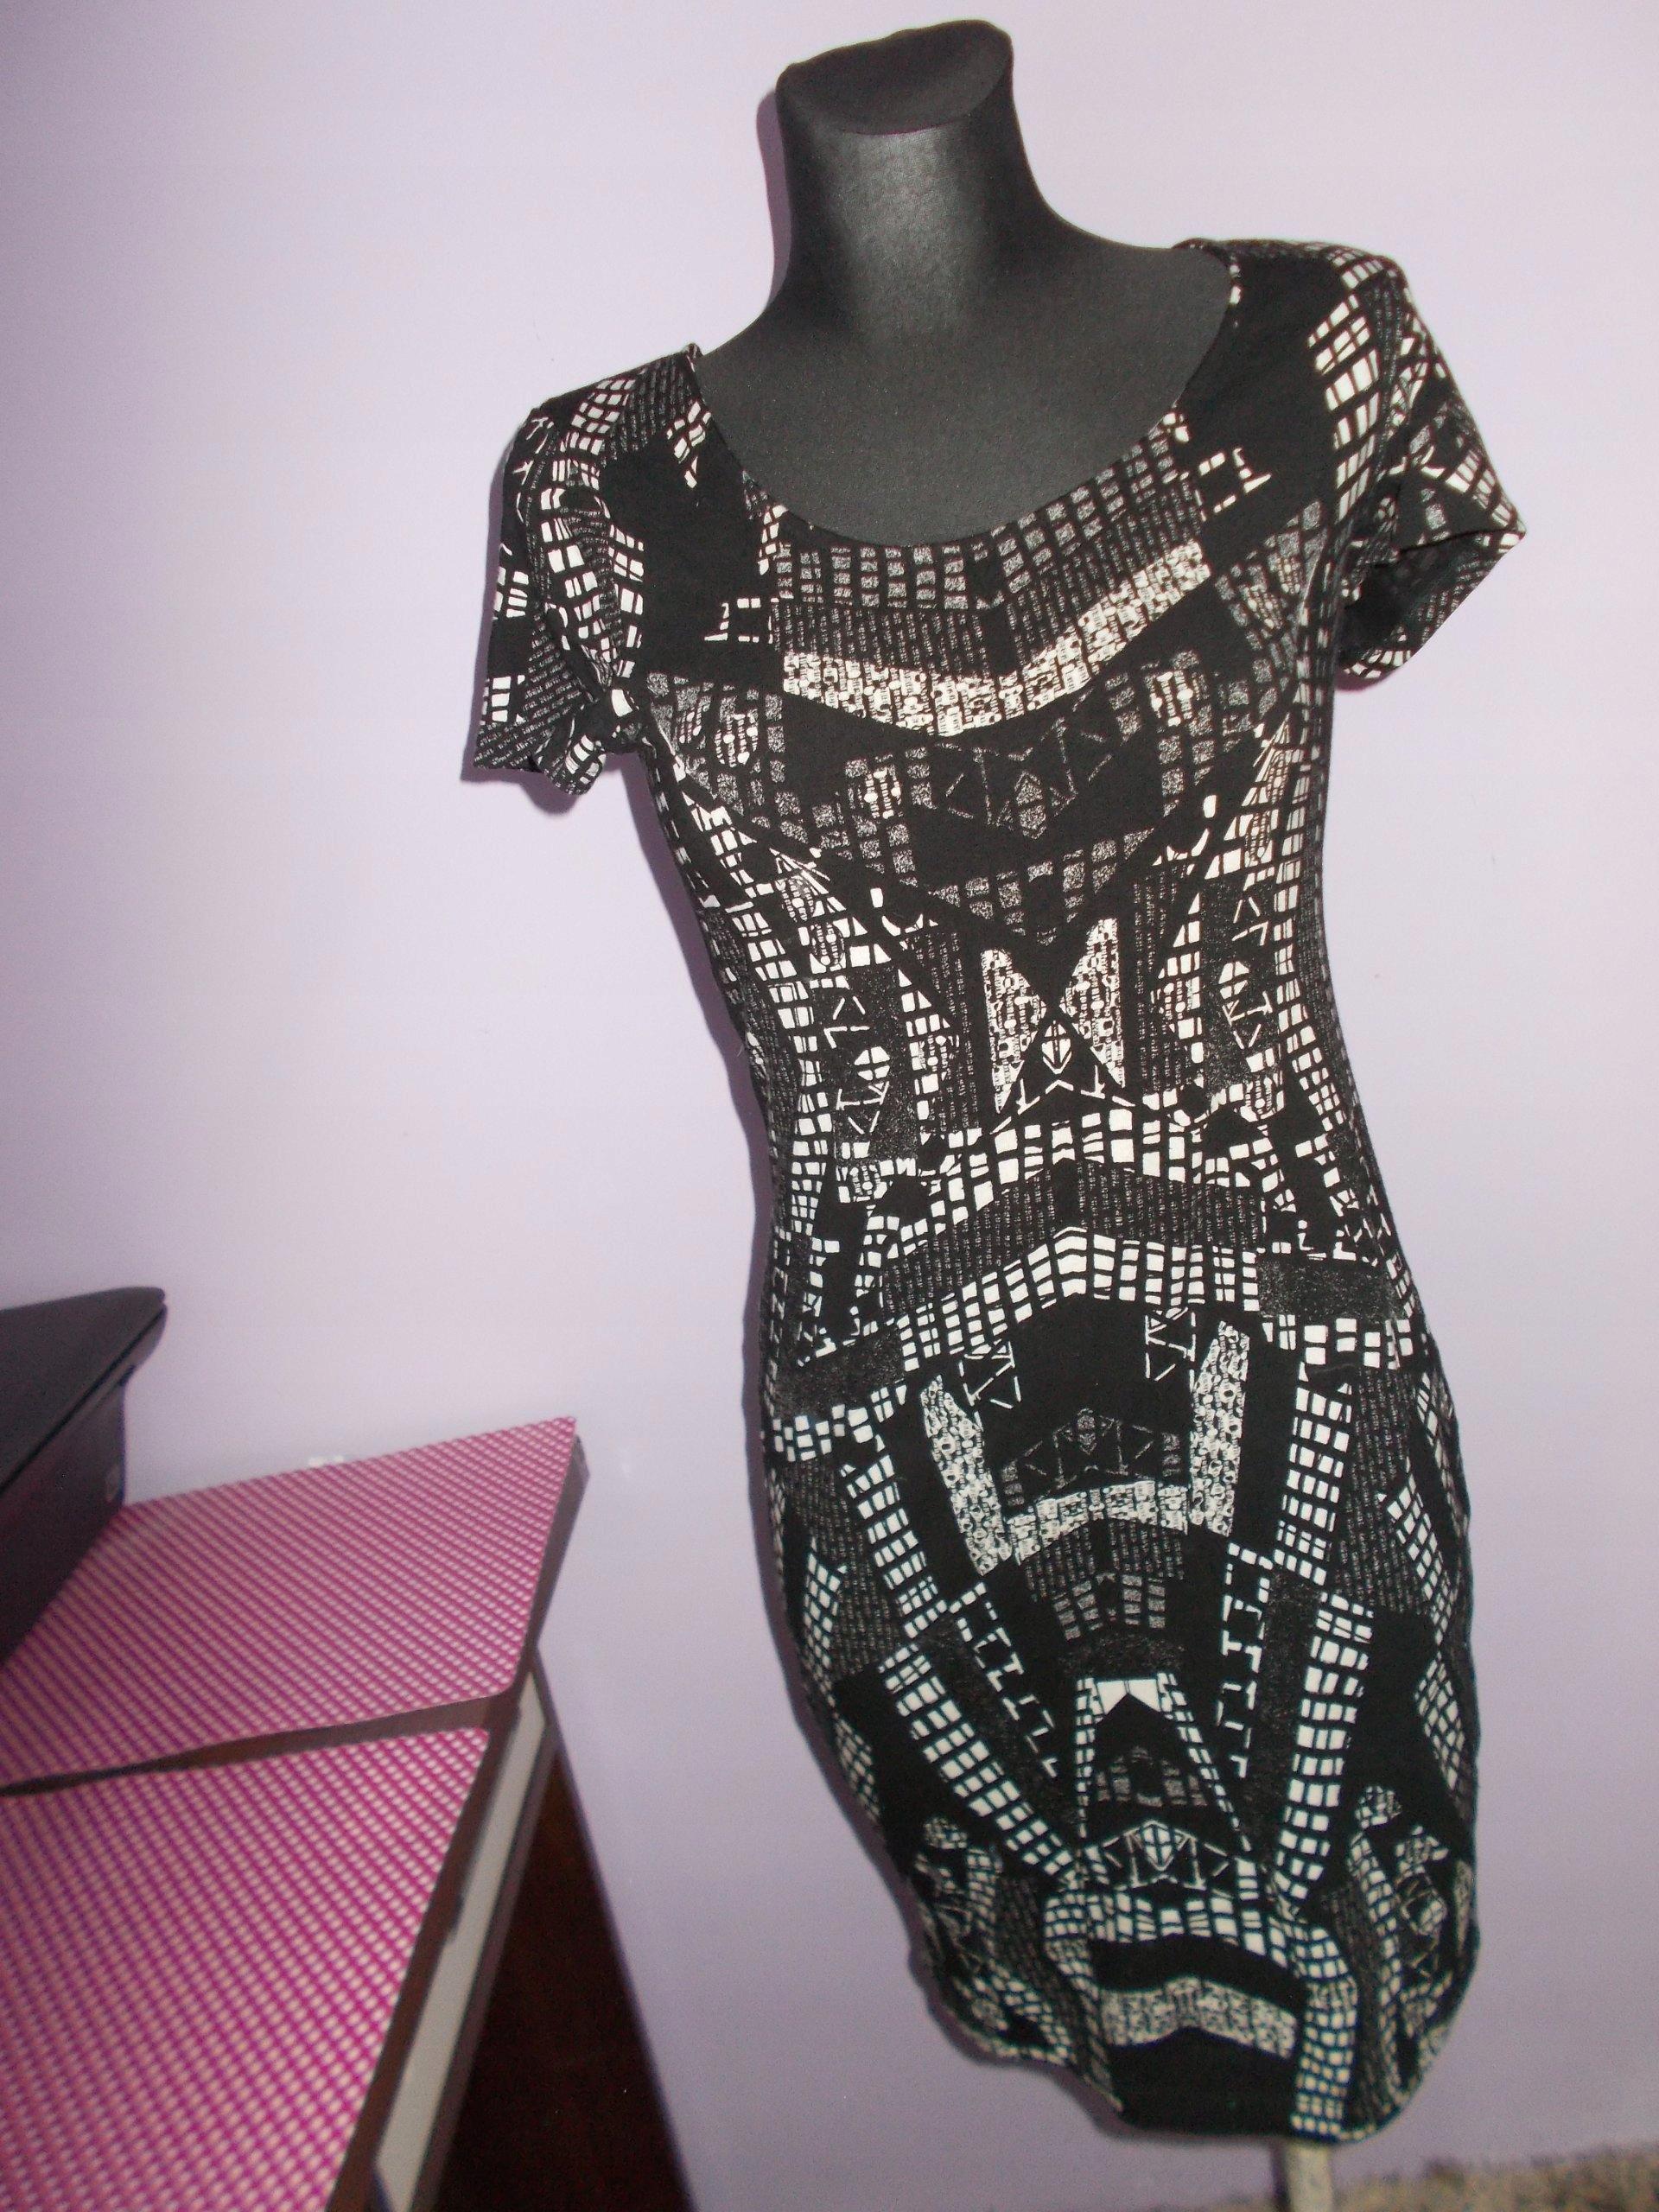 cc8fb9caaa H M sukienka wzory aztec S - 7489937508 - oficjalne archiwum allegro